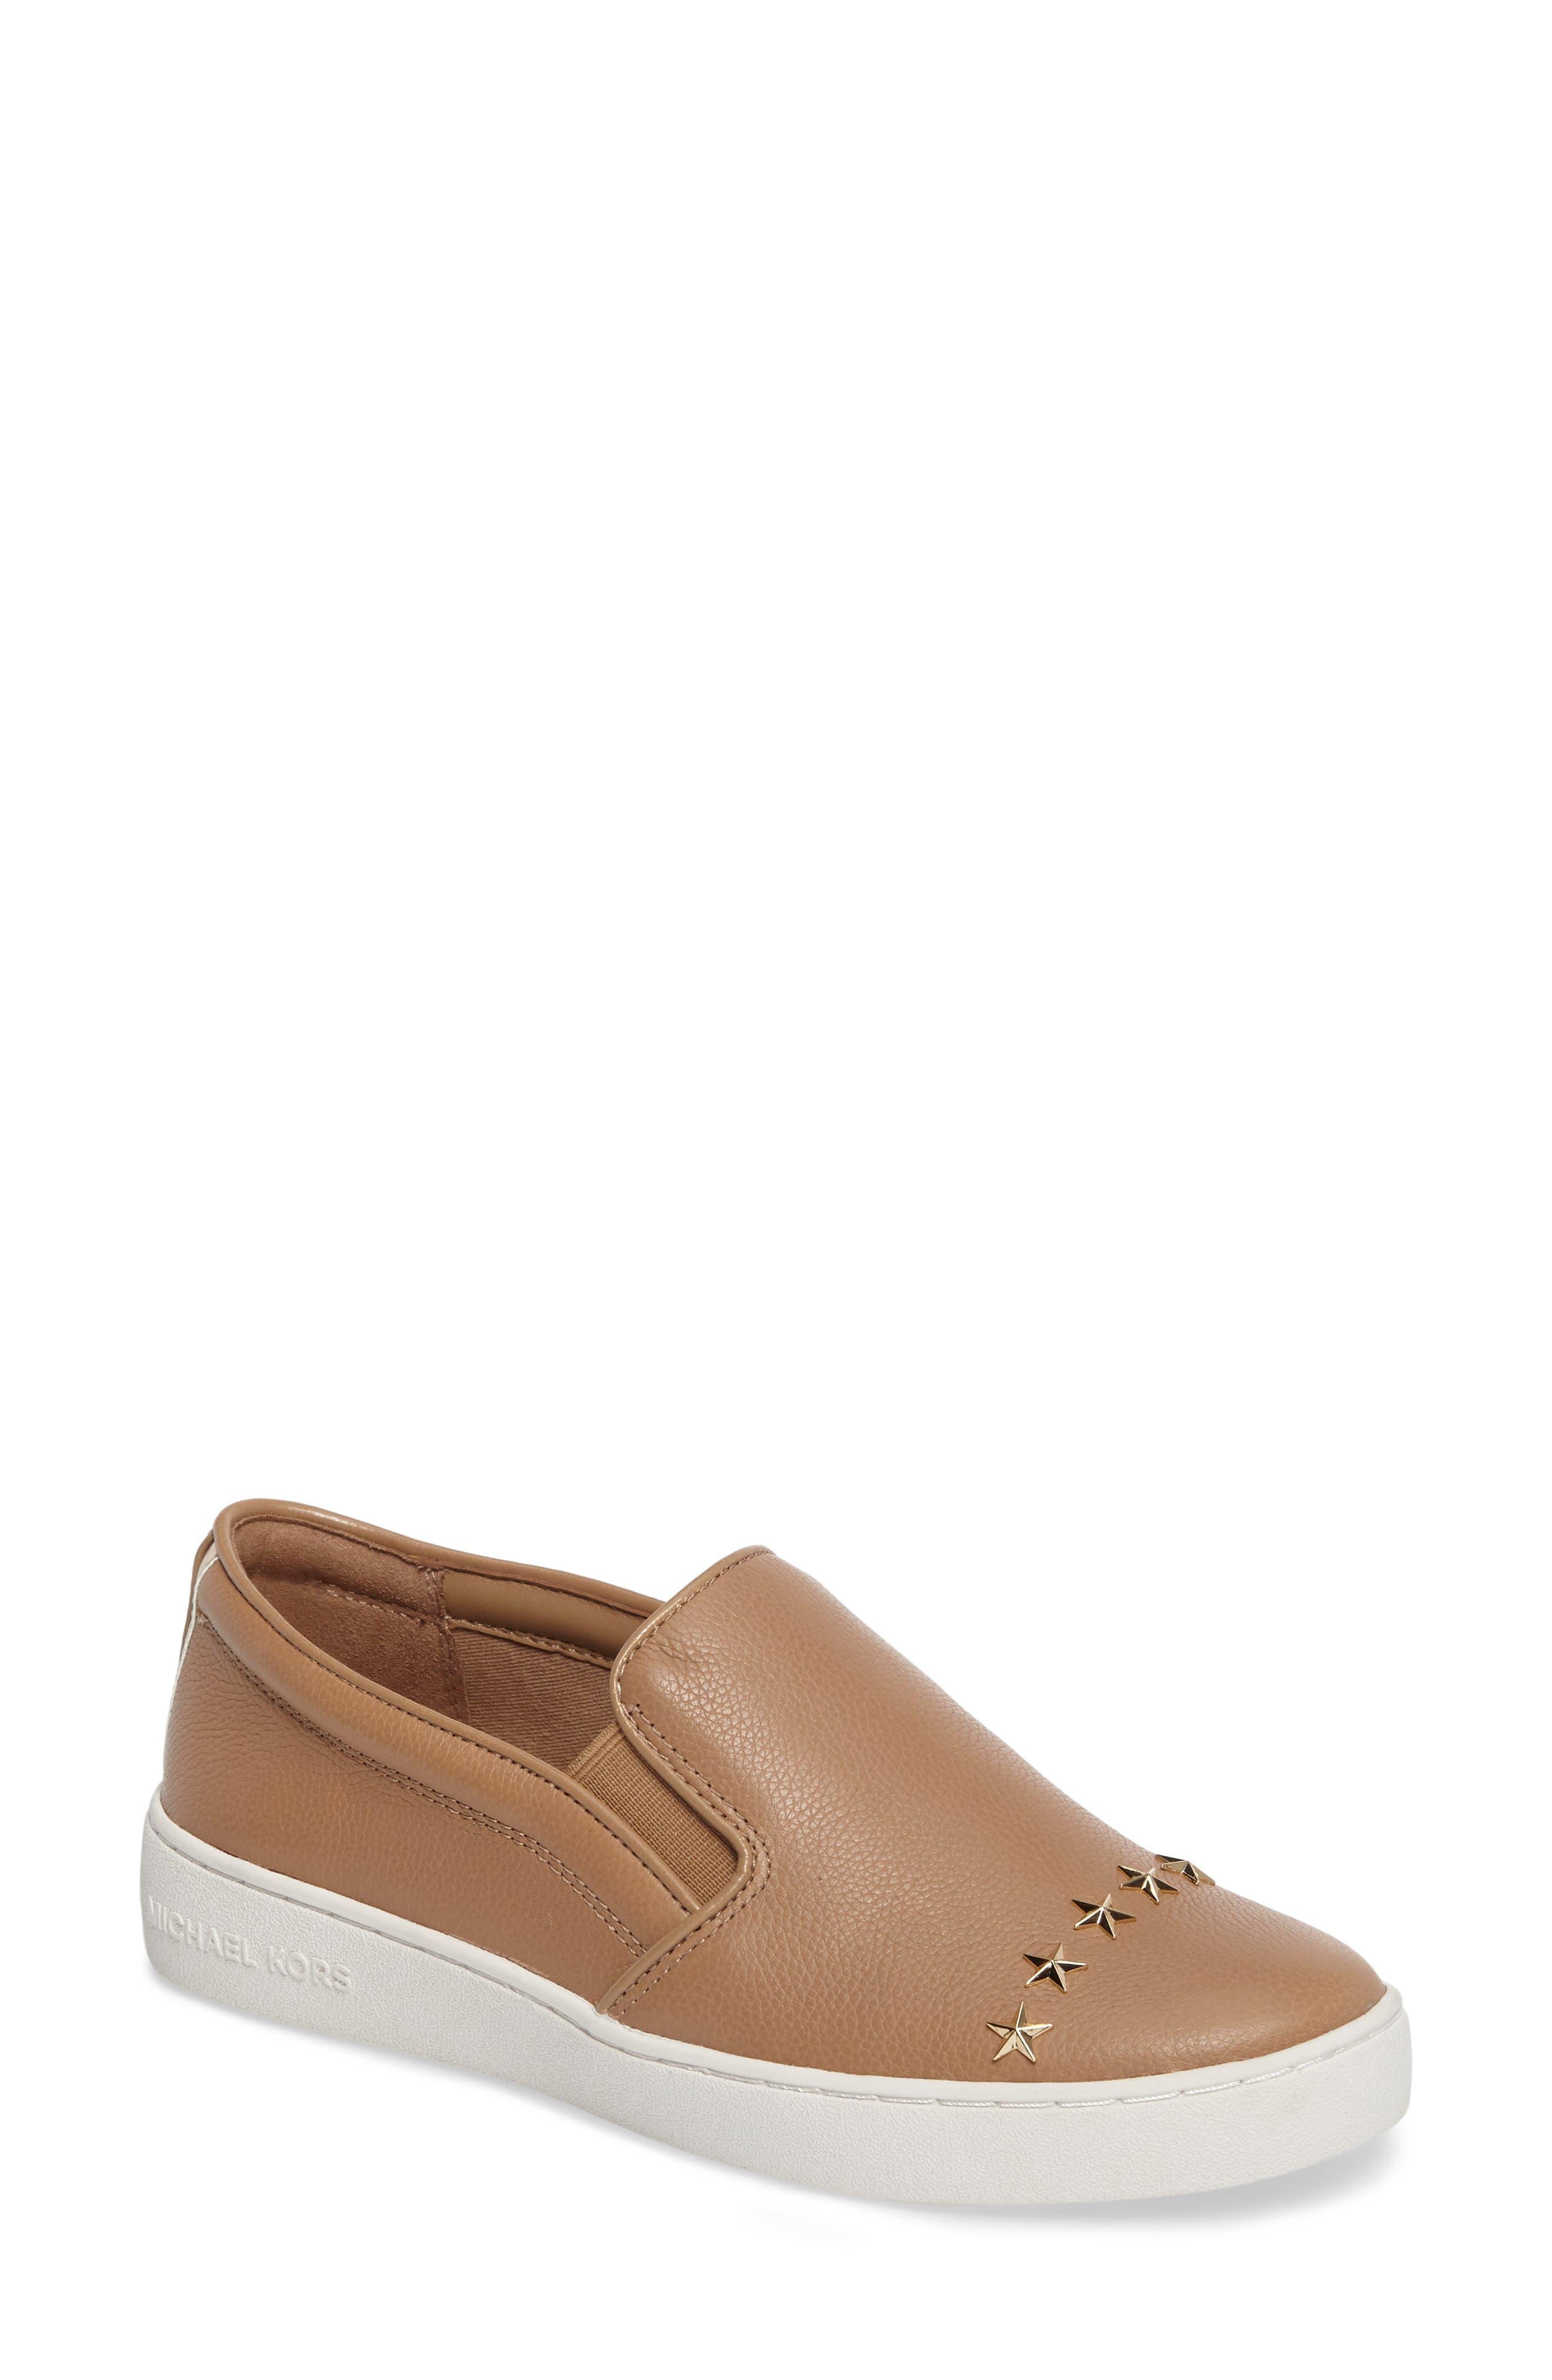 Keaton Slip-On Sneaker,                         Main,                         color, Dark Khaki Star Stud